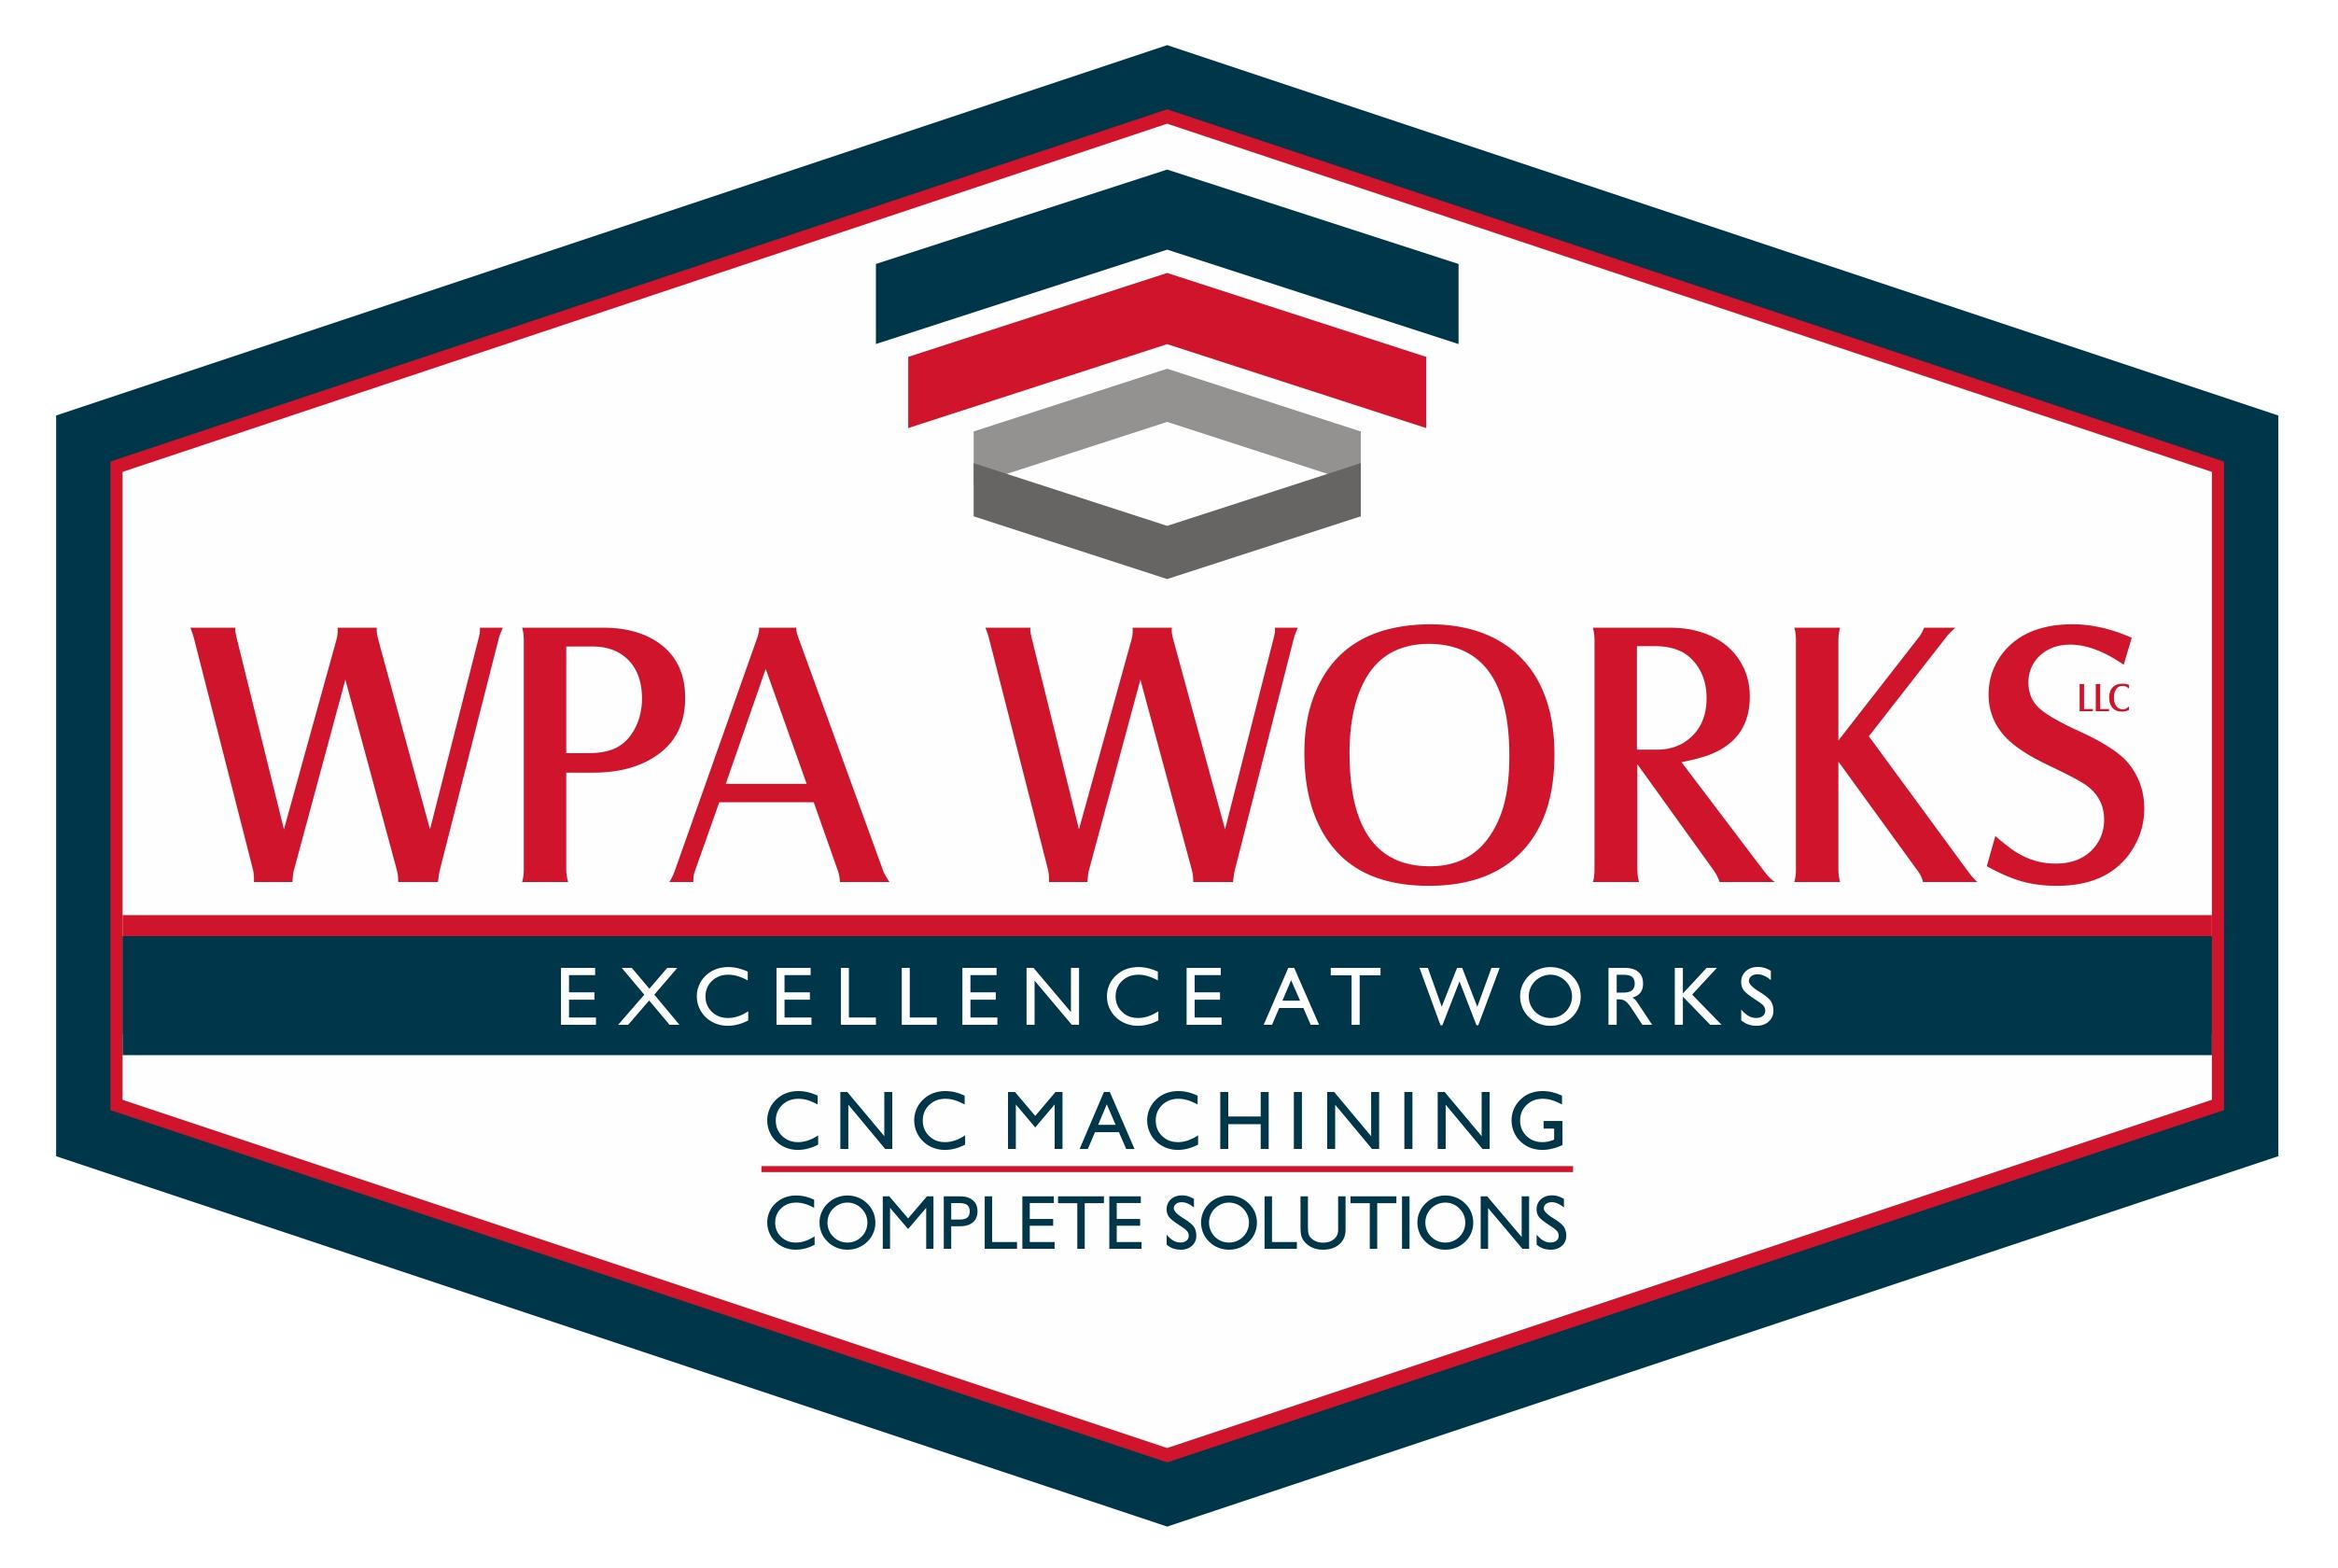 WPA Works LLC